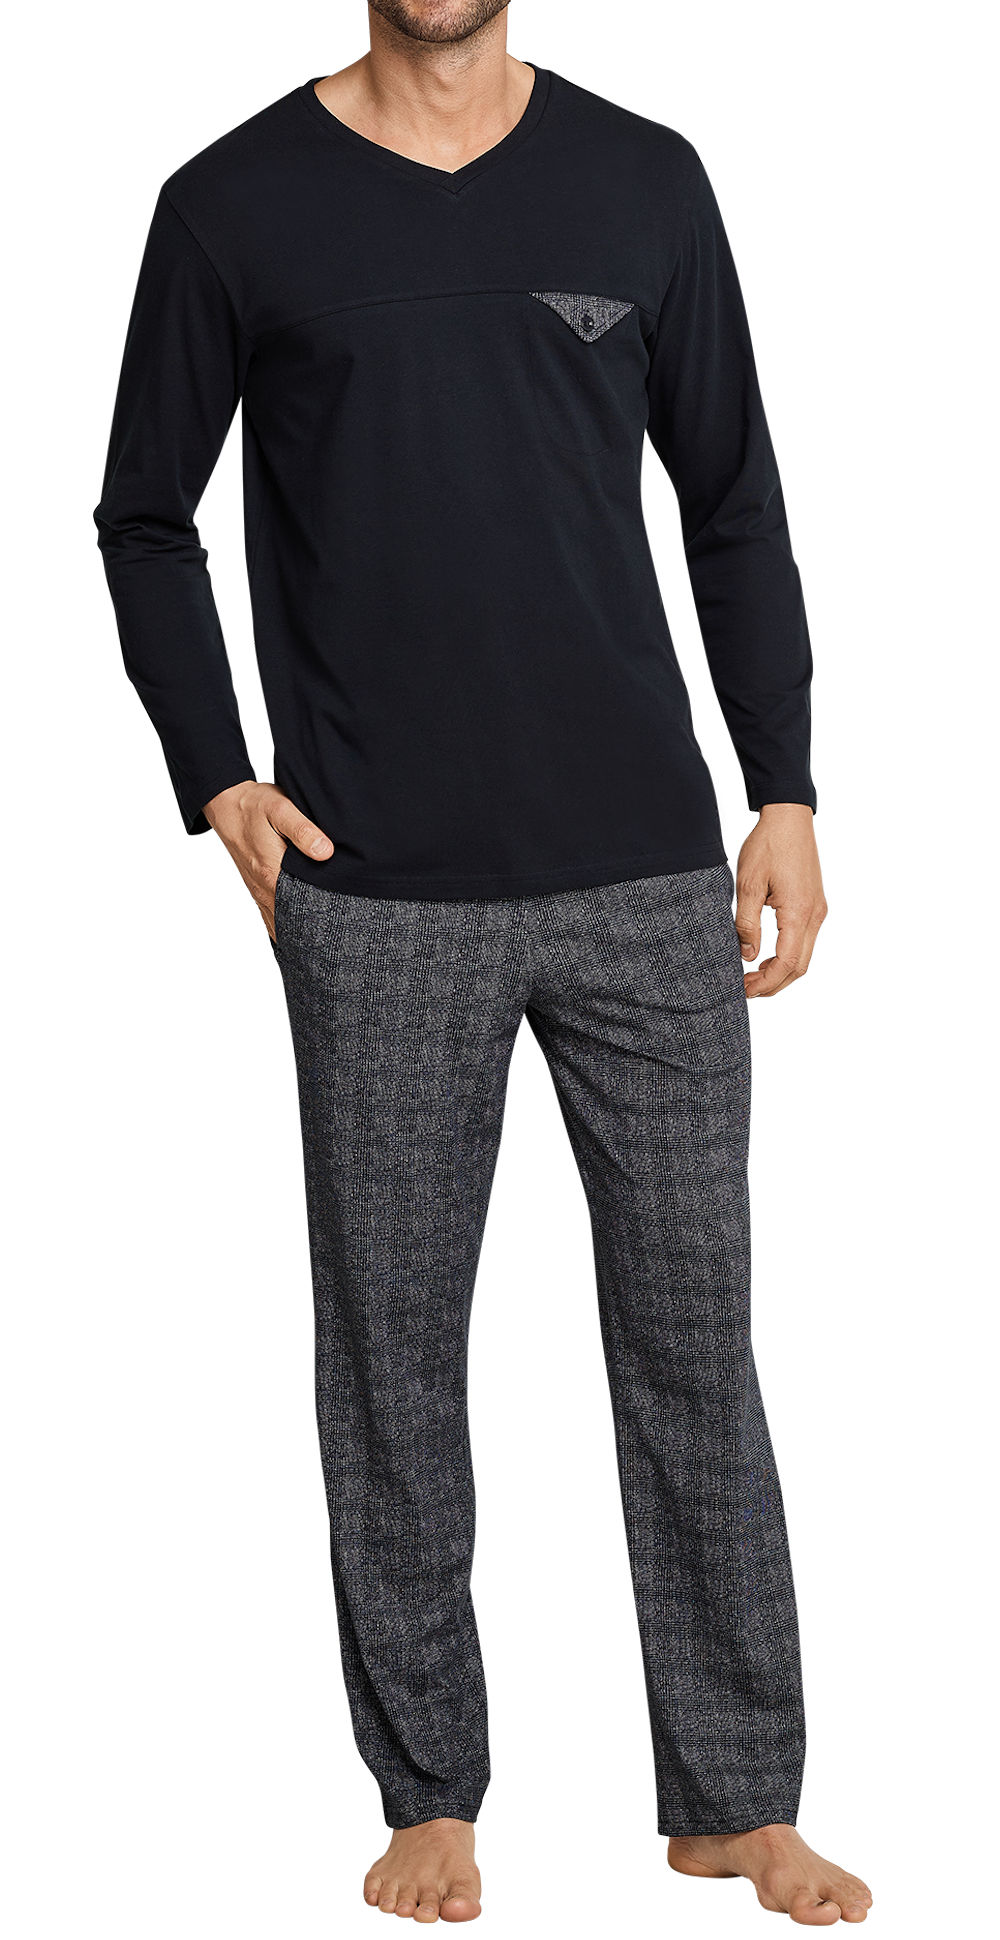 info for bca6d a5d4b Seidensticker Herren Zweiteiliger Schlafanzug Pyjama Anzug lang 163623-000